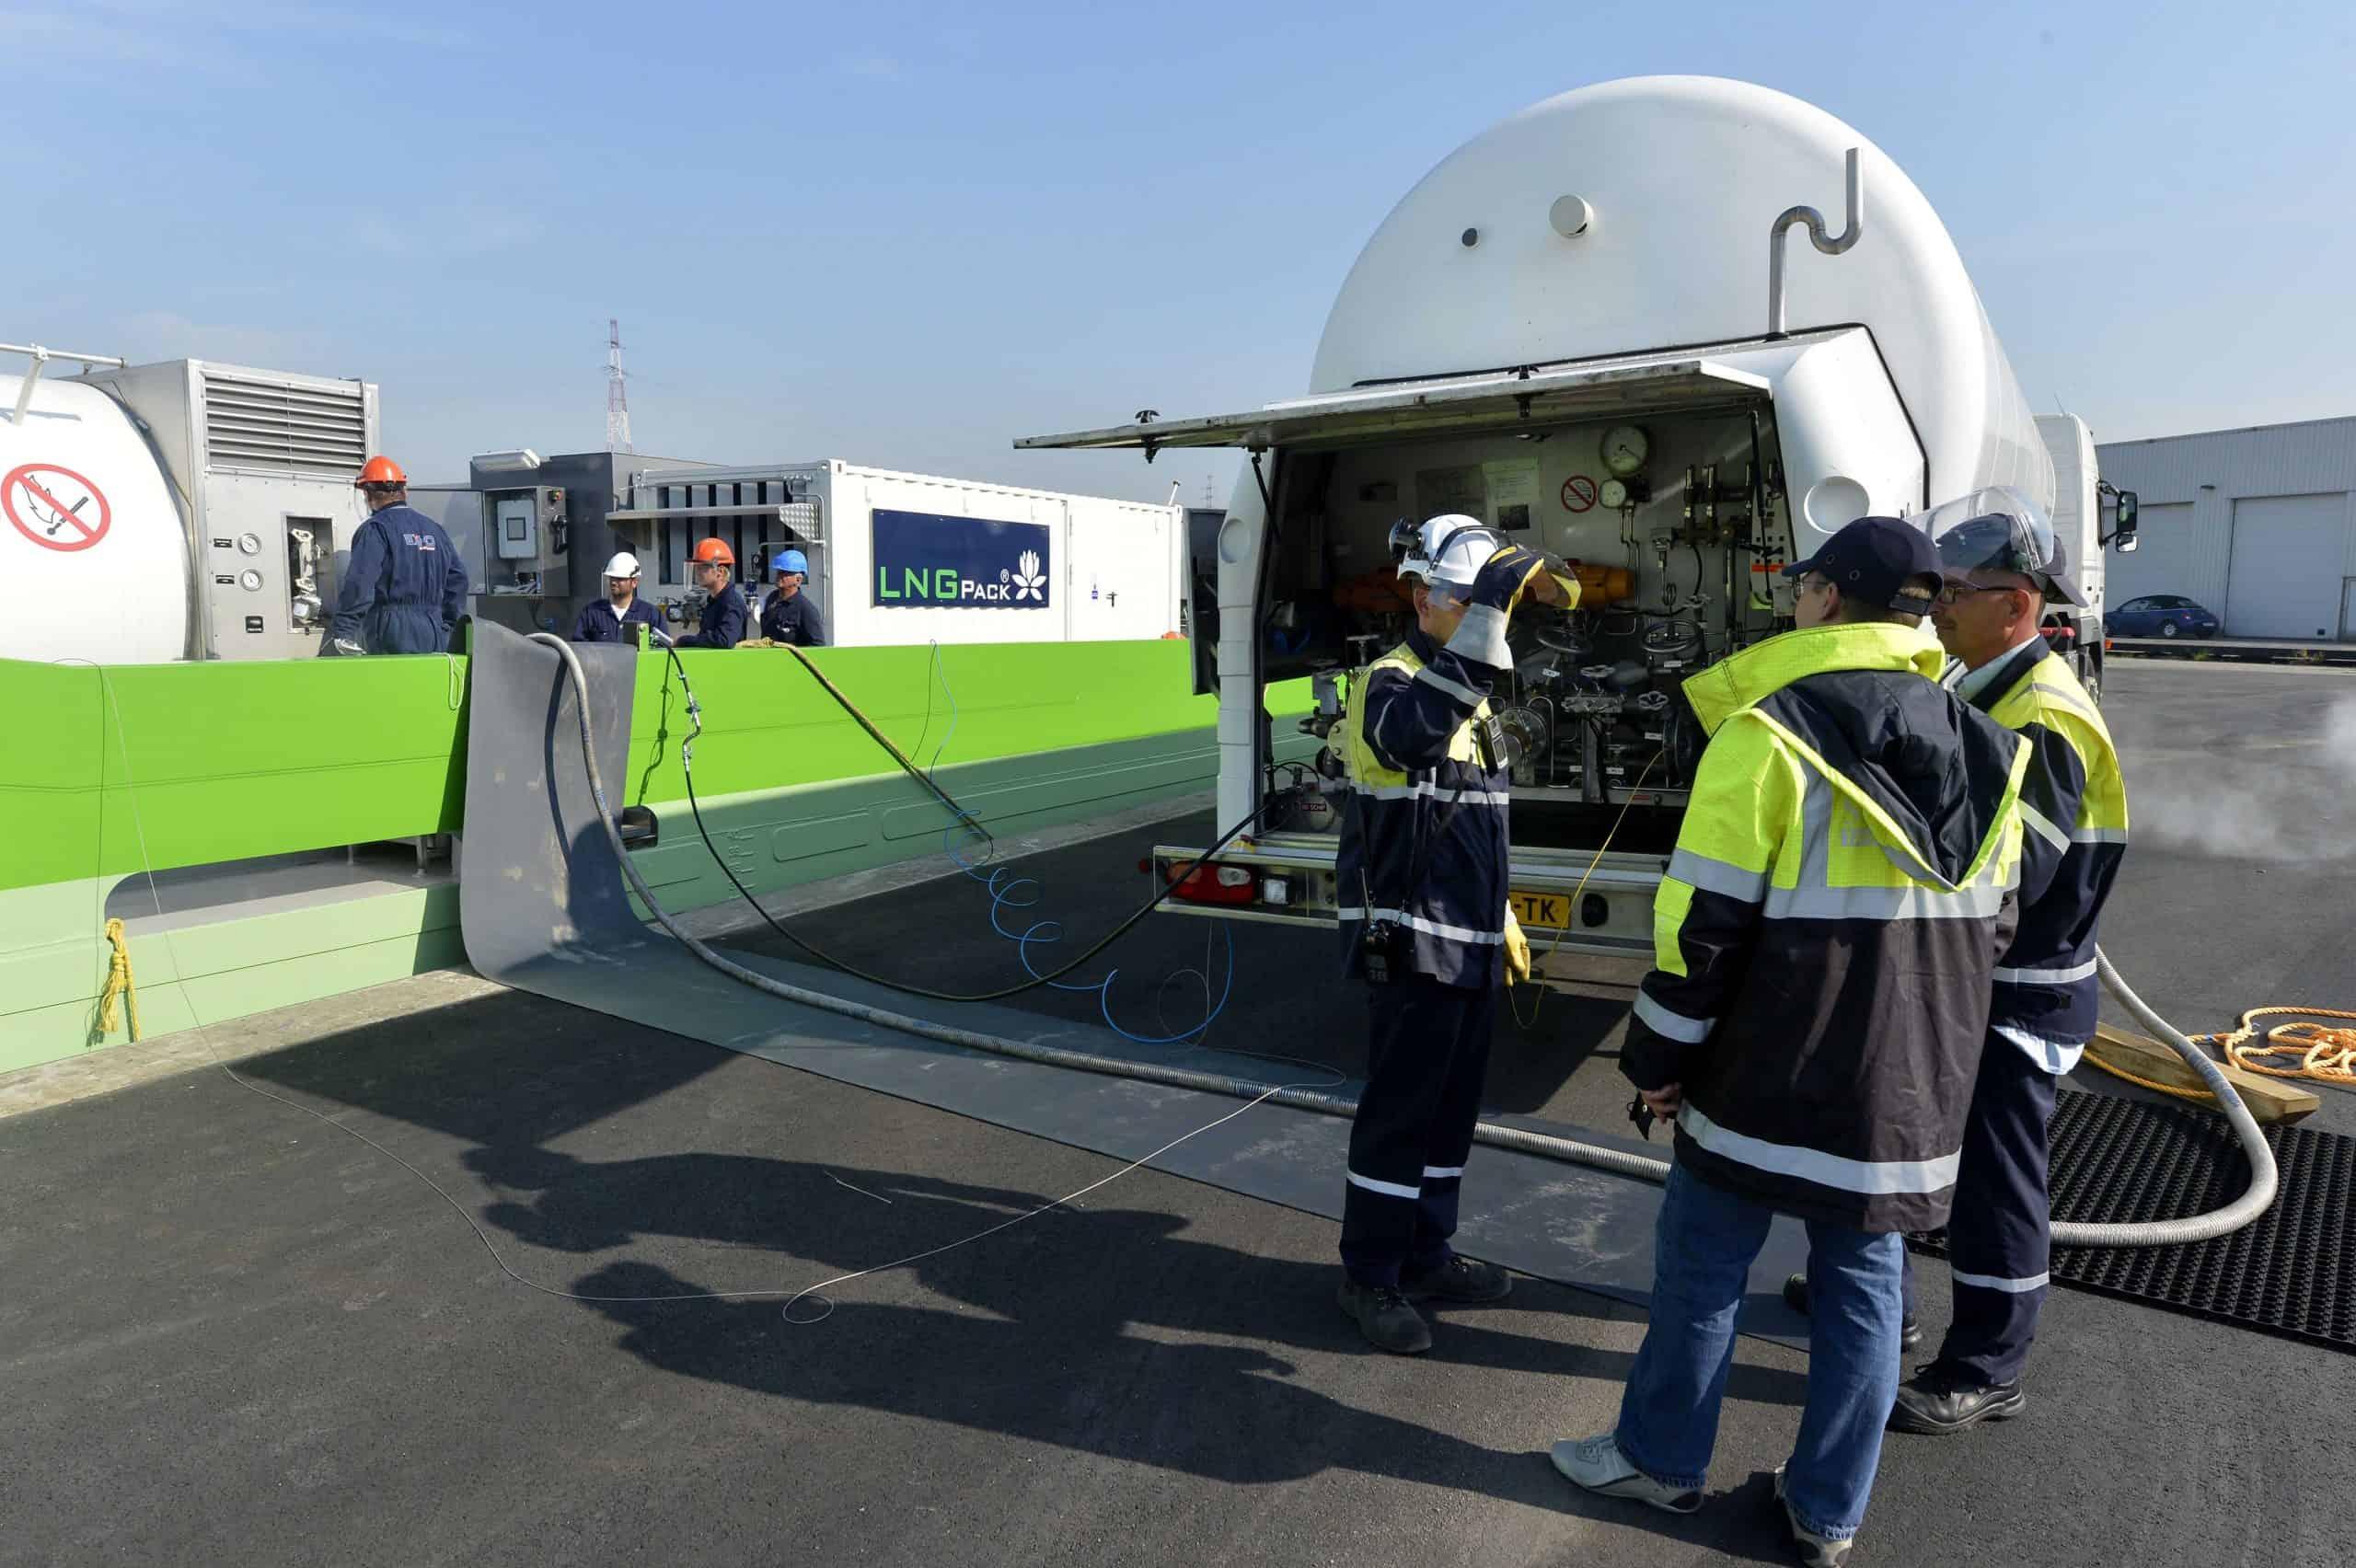 Antwerp issues tender for LNG bunkering station